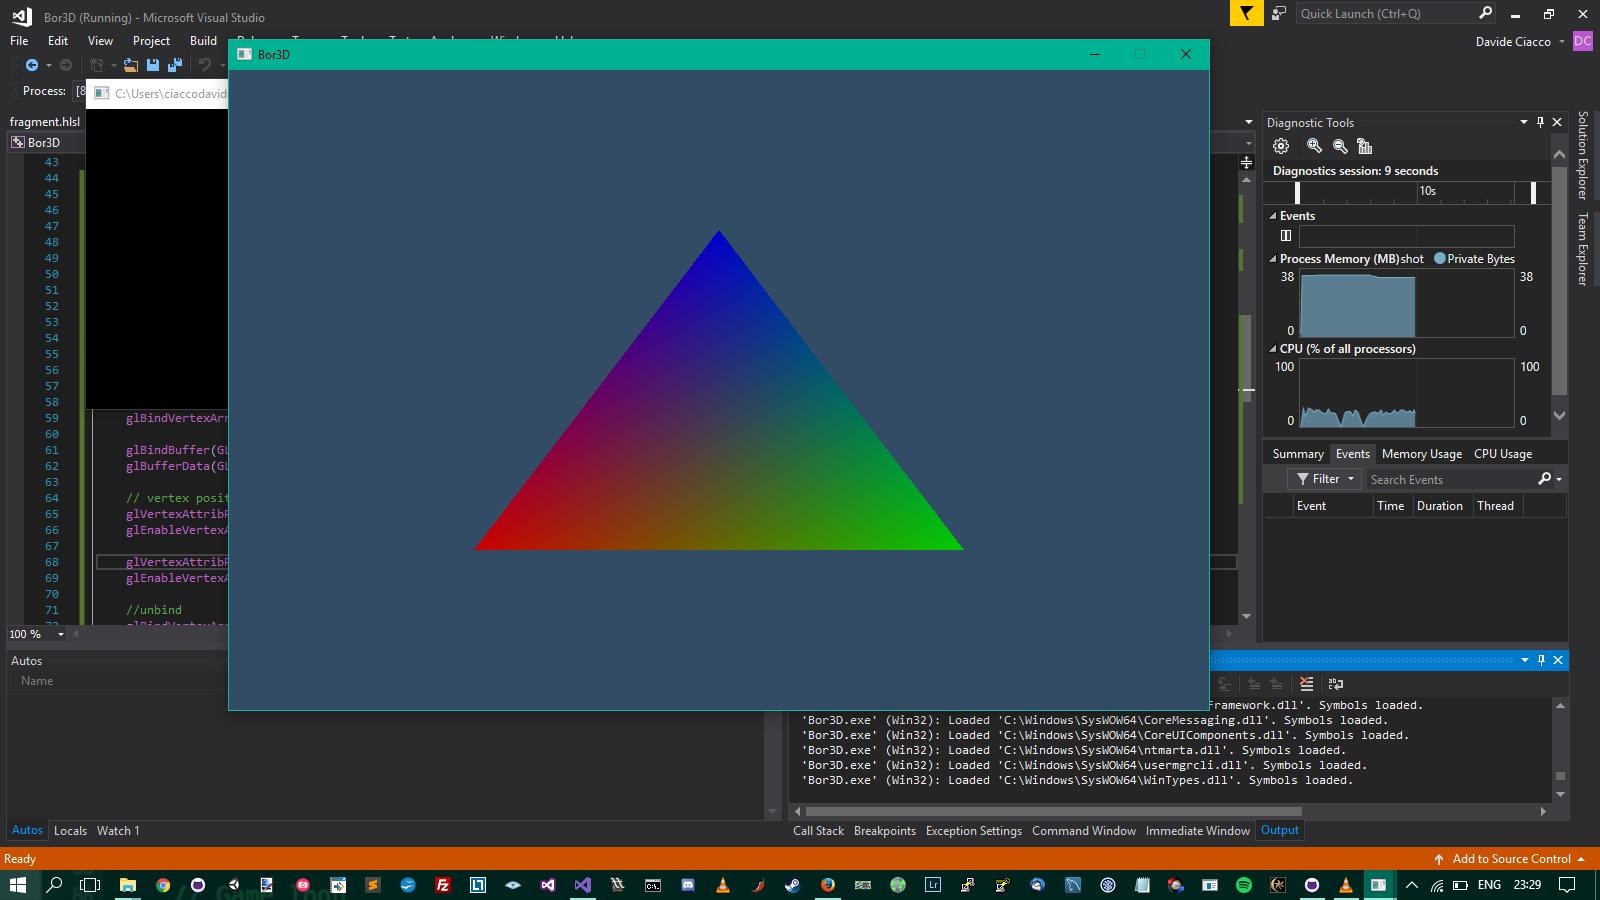 vertex and fragment shaders